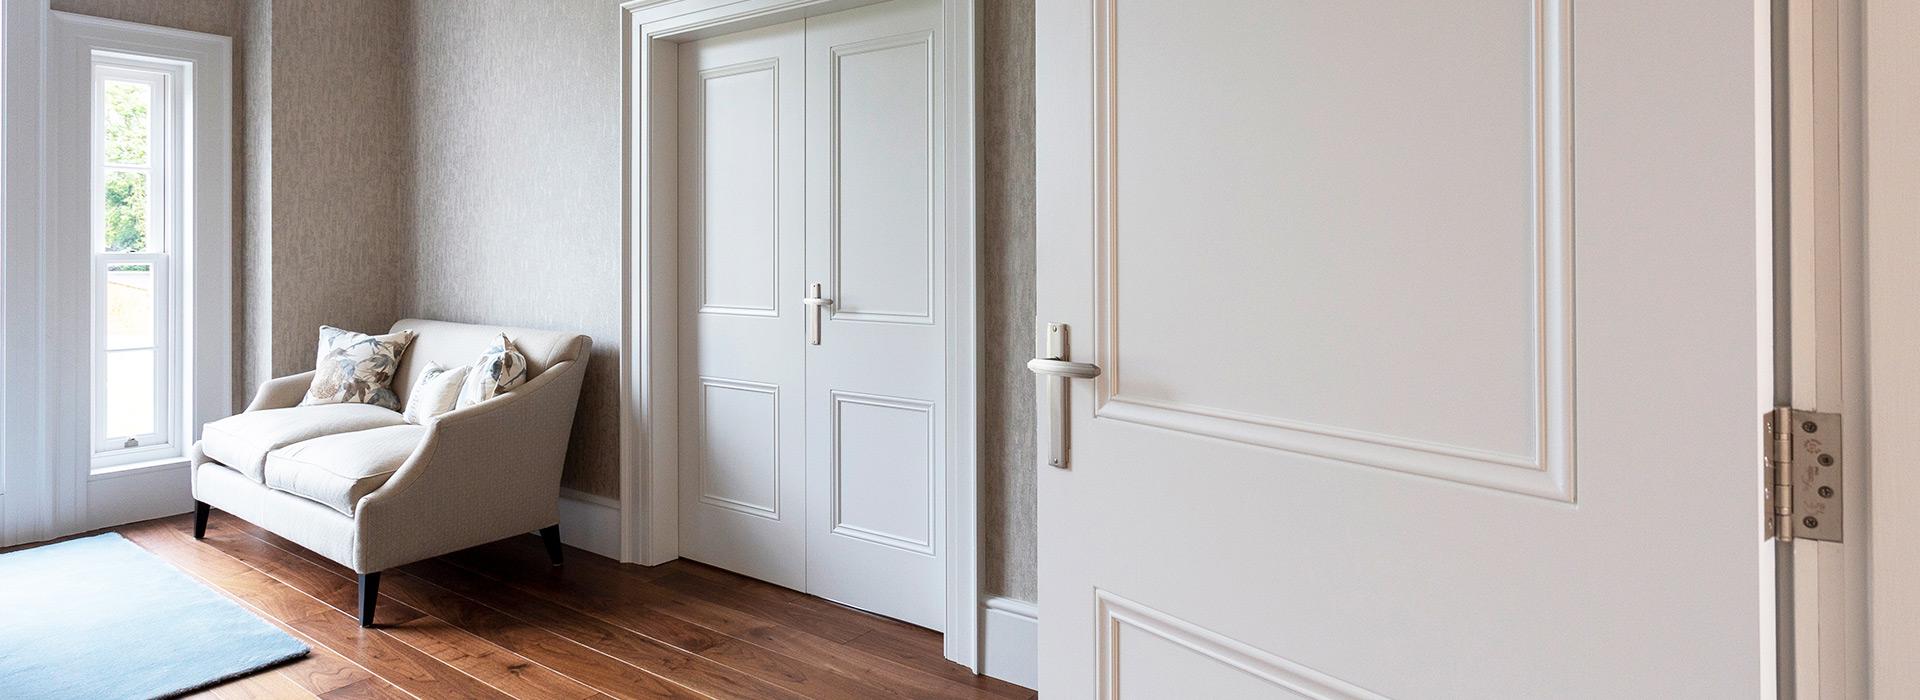 Knightsbridge interior doors